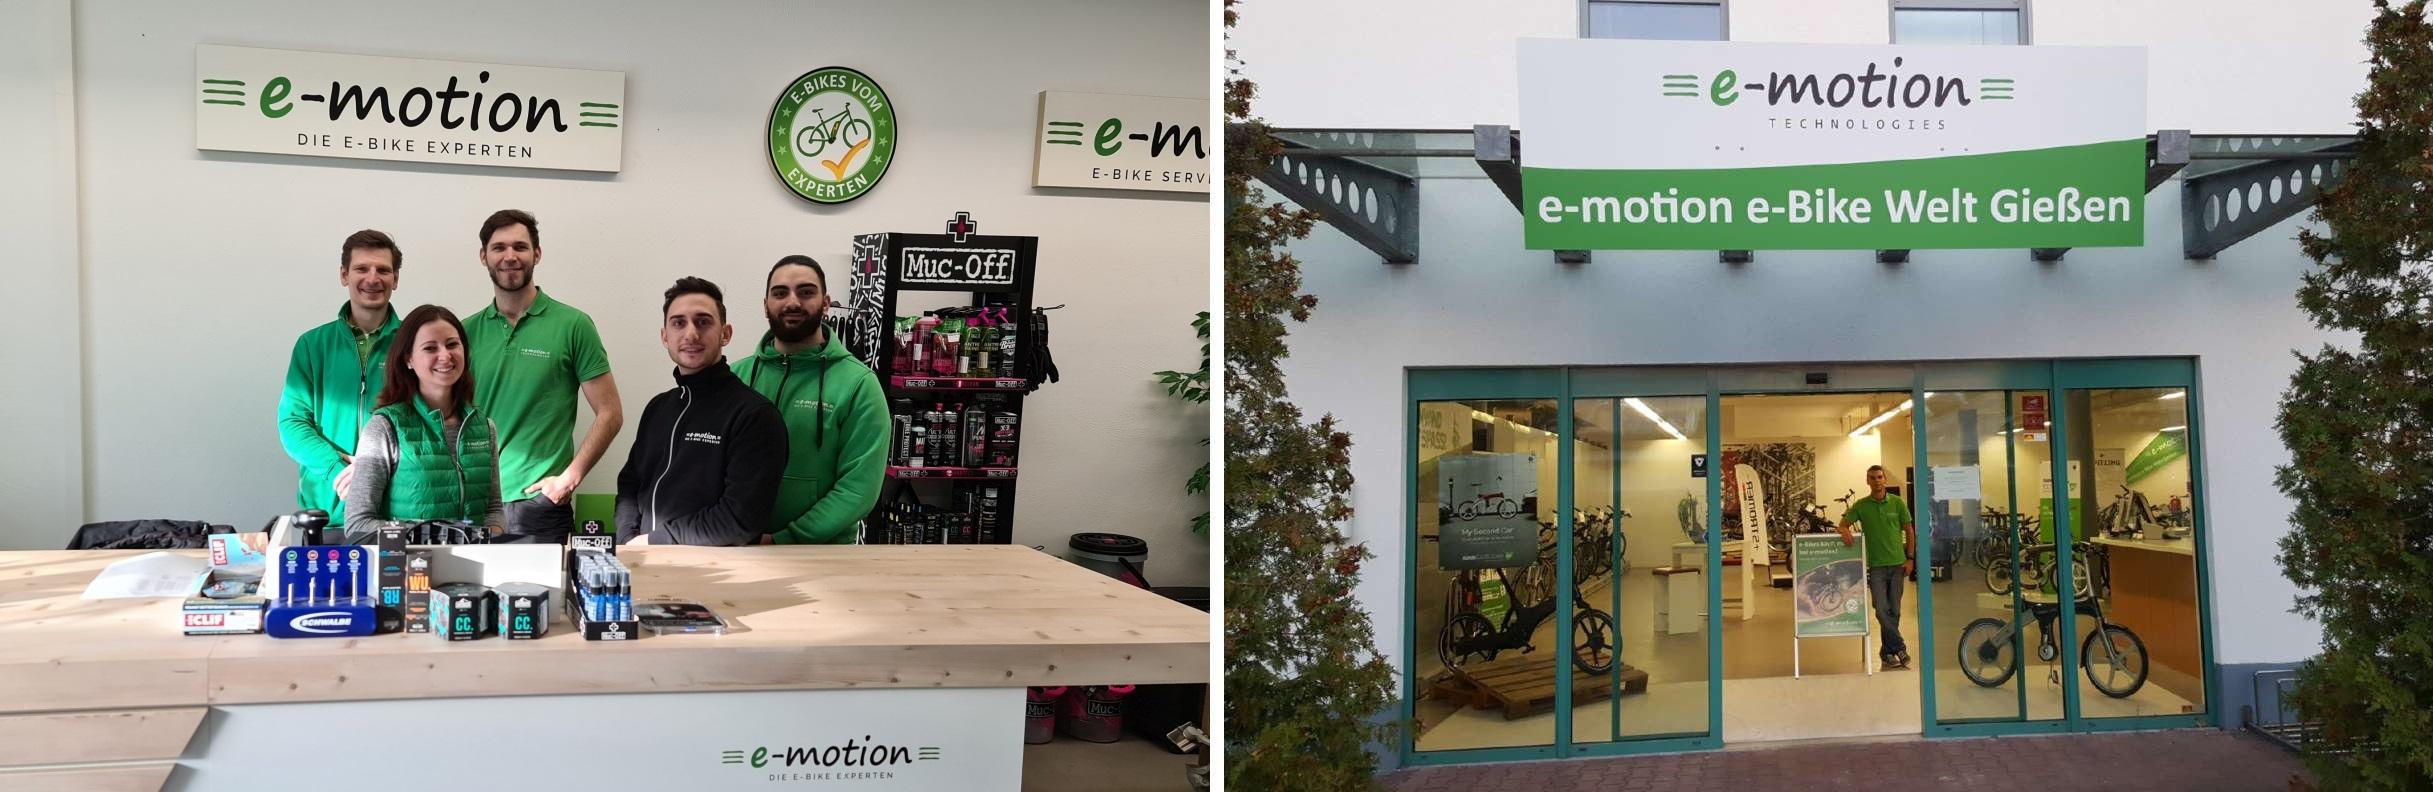 e-motion e-Bike Welt Gießen